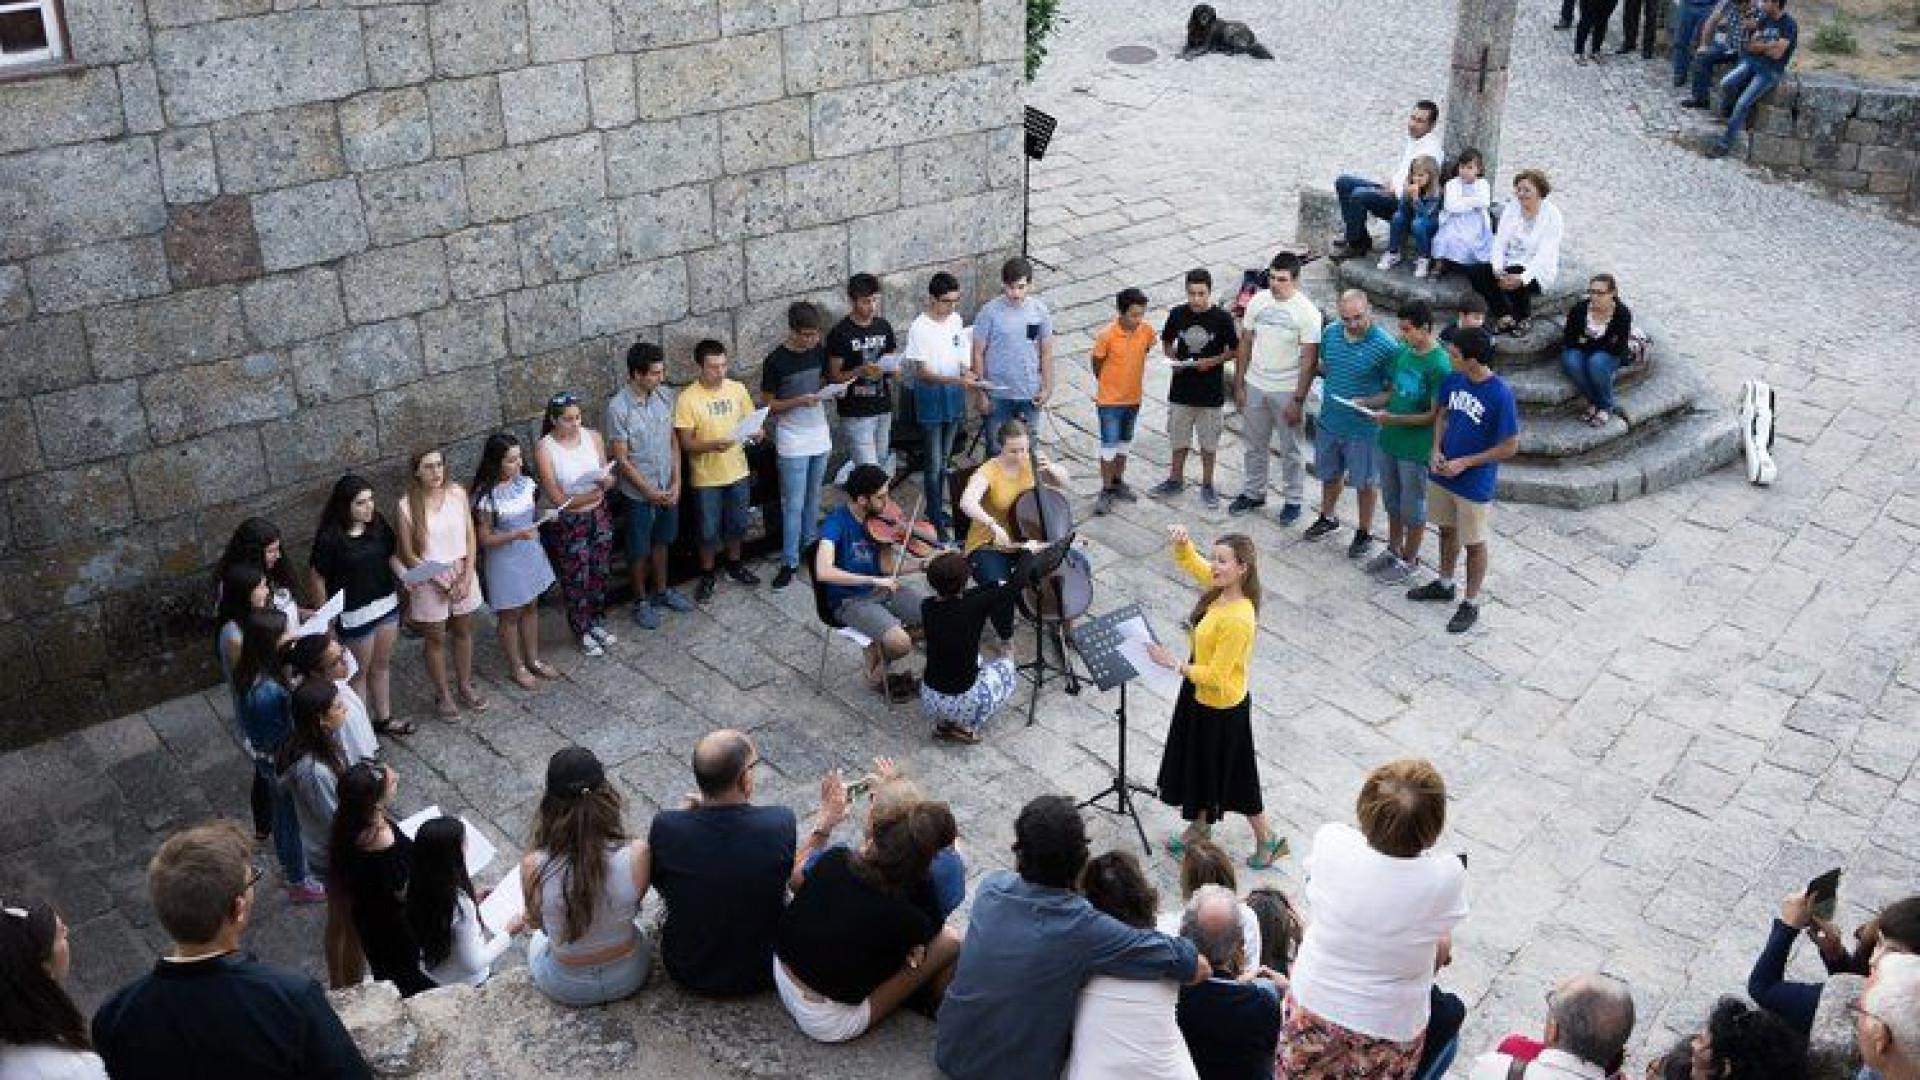 Festival de música junta alunos nacionais e estrangeiros na Guarda